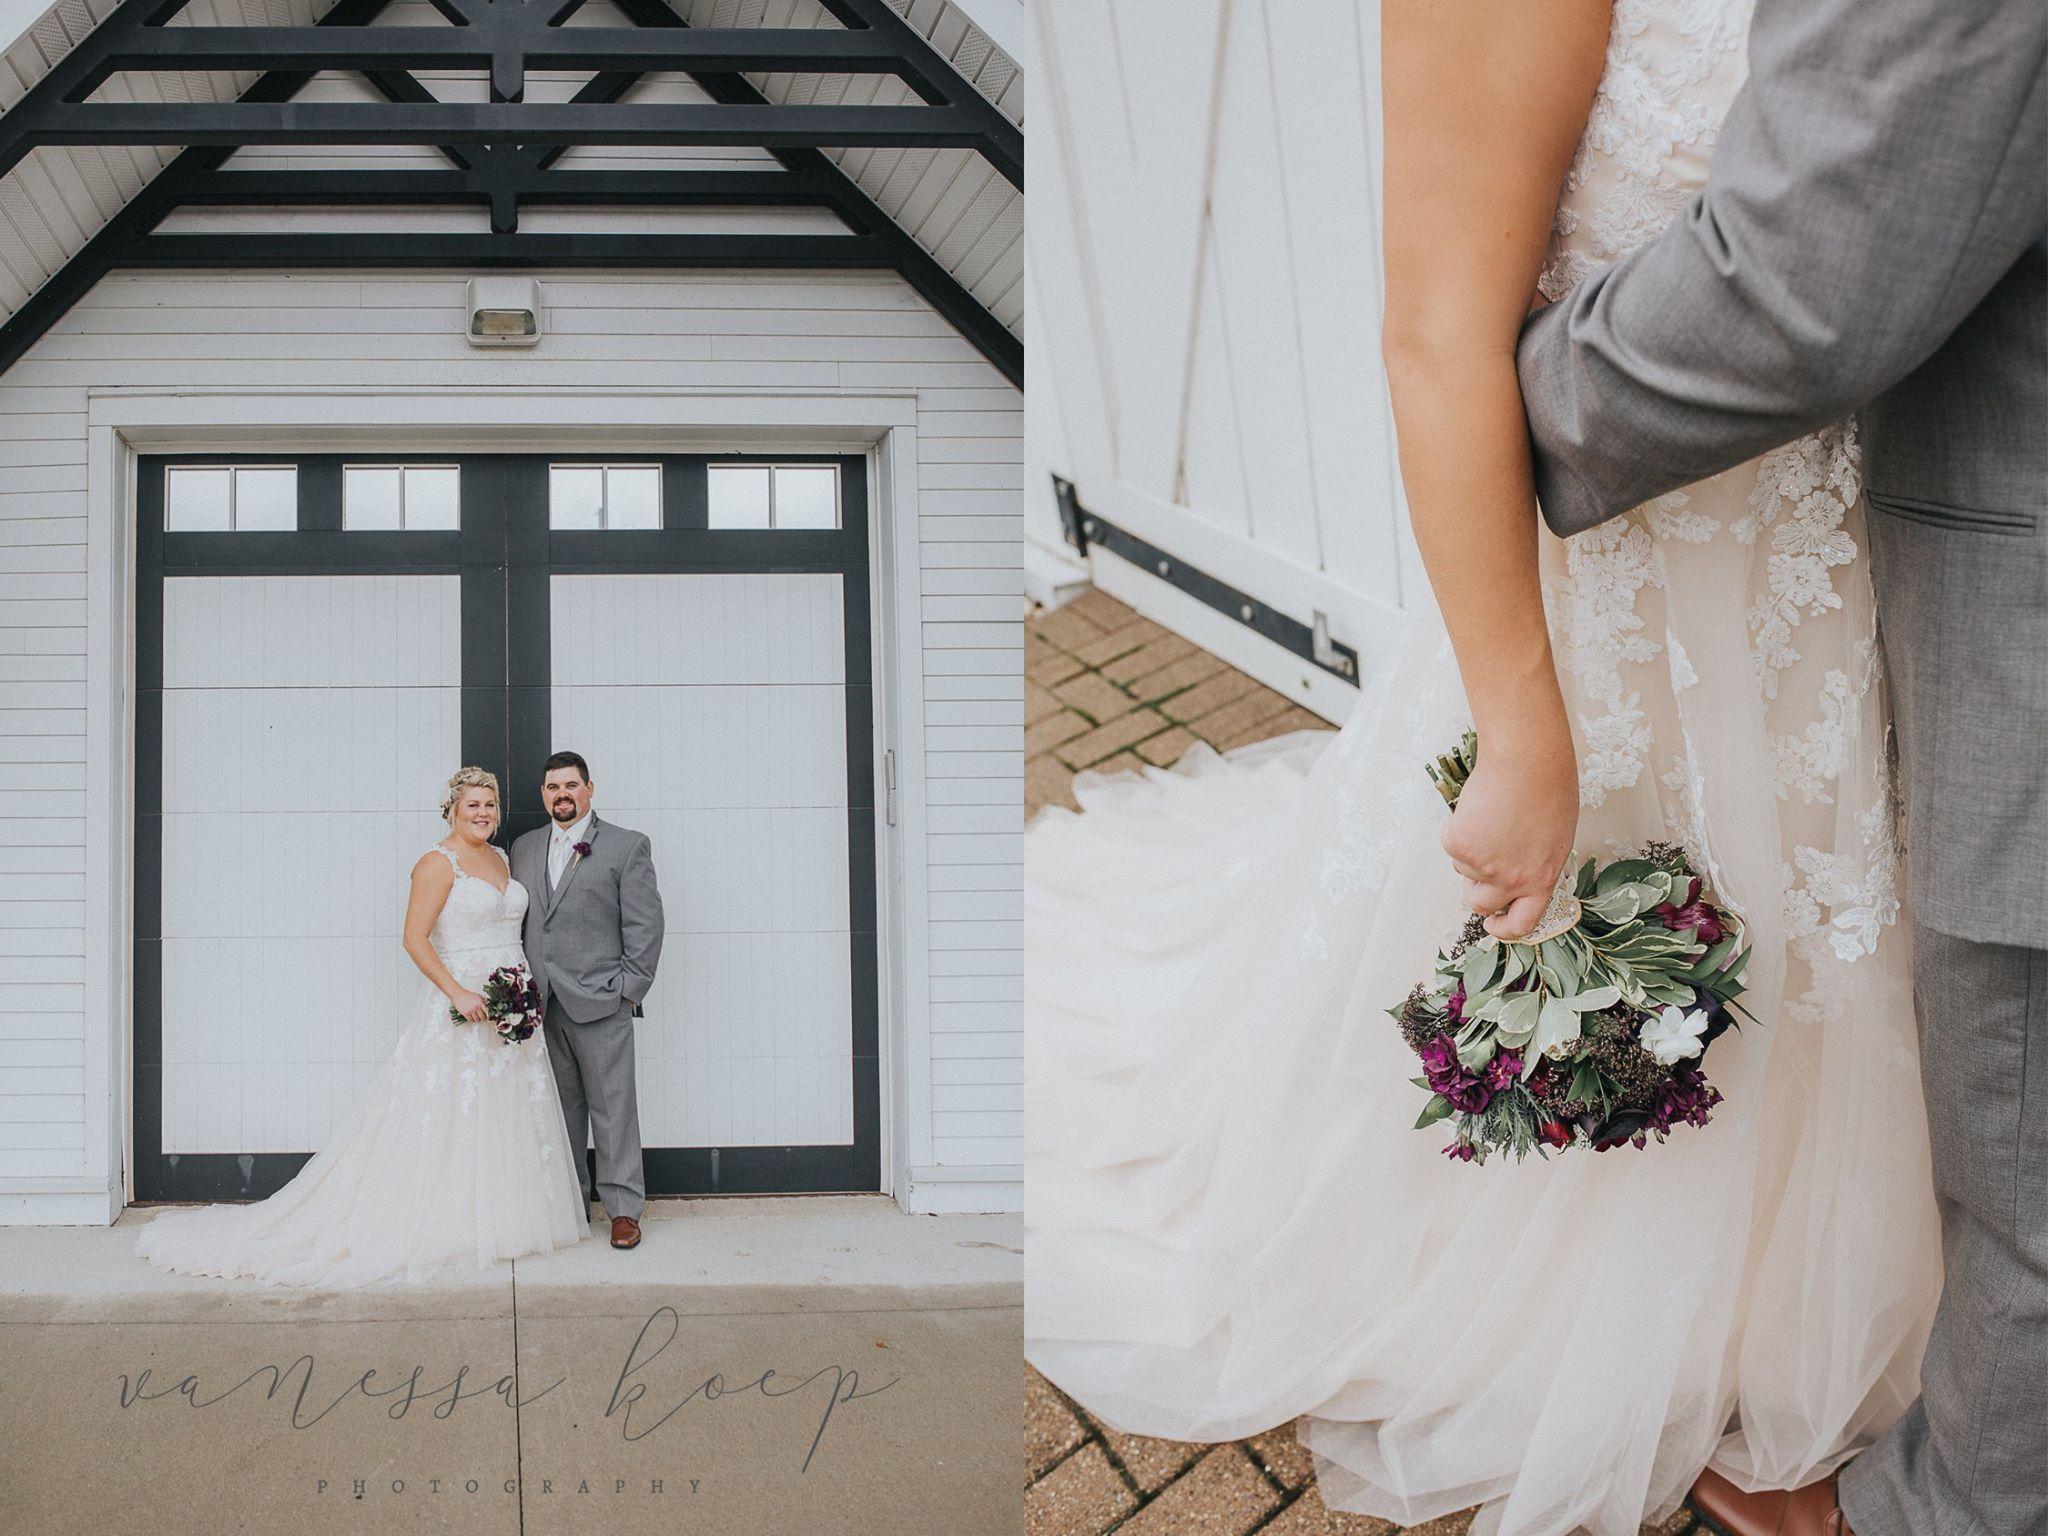 Summer wedding photography ideas. White wedding. Barn doors. Central ...